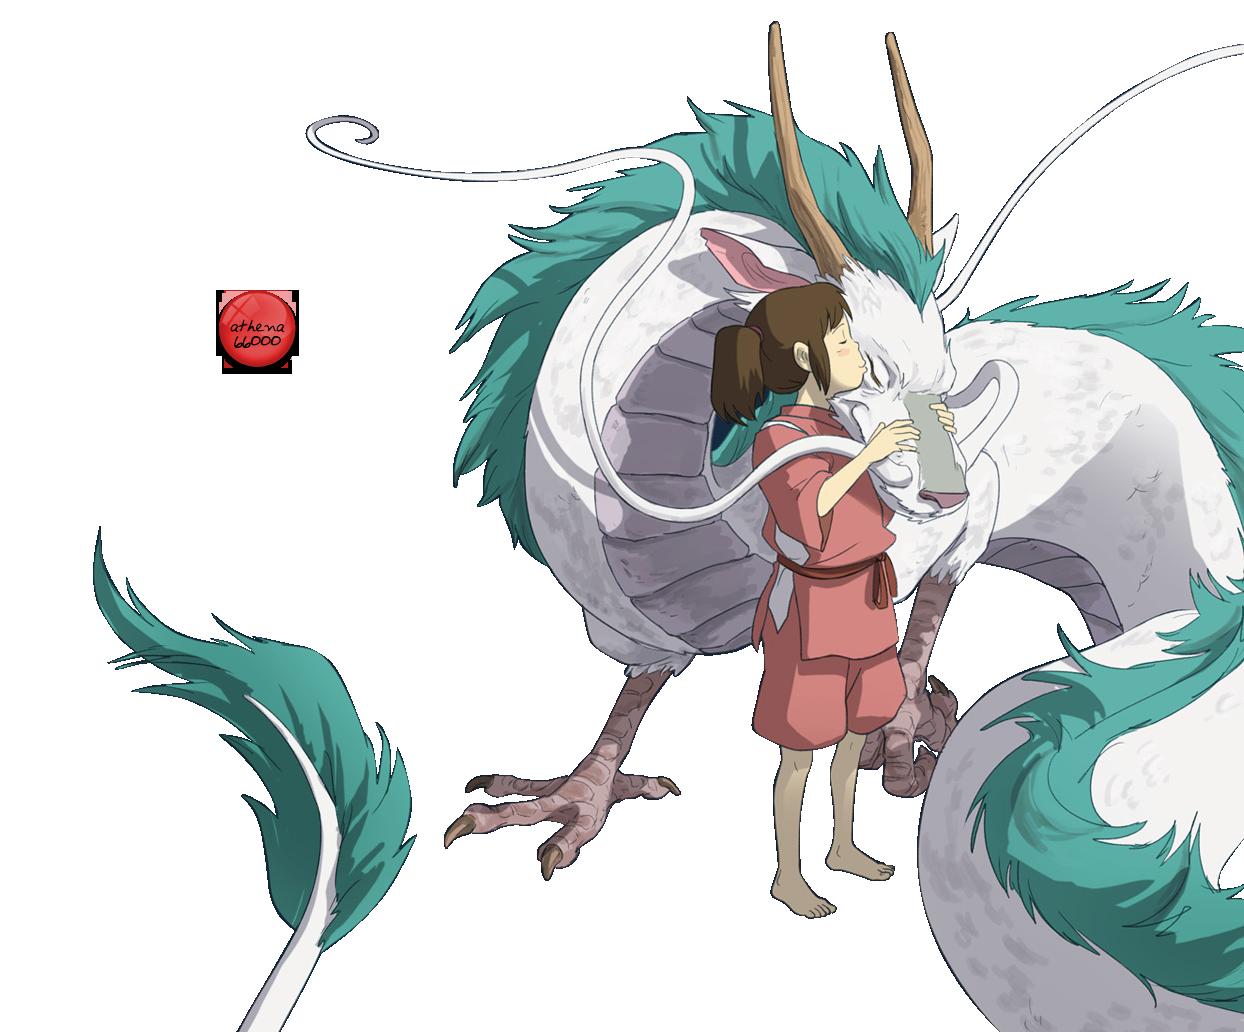 Image Result For Haku Spirited Away Png Le Voyage De Chihiro Ghibli Dessin Voyage